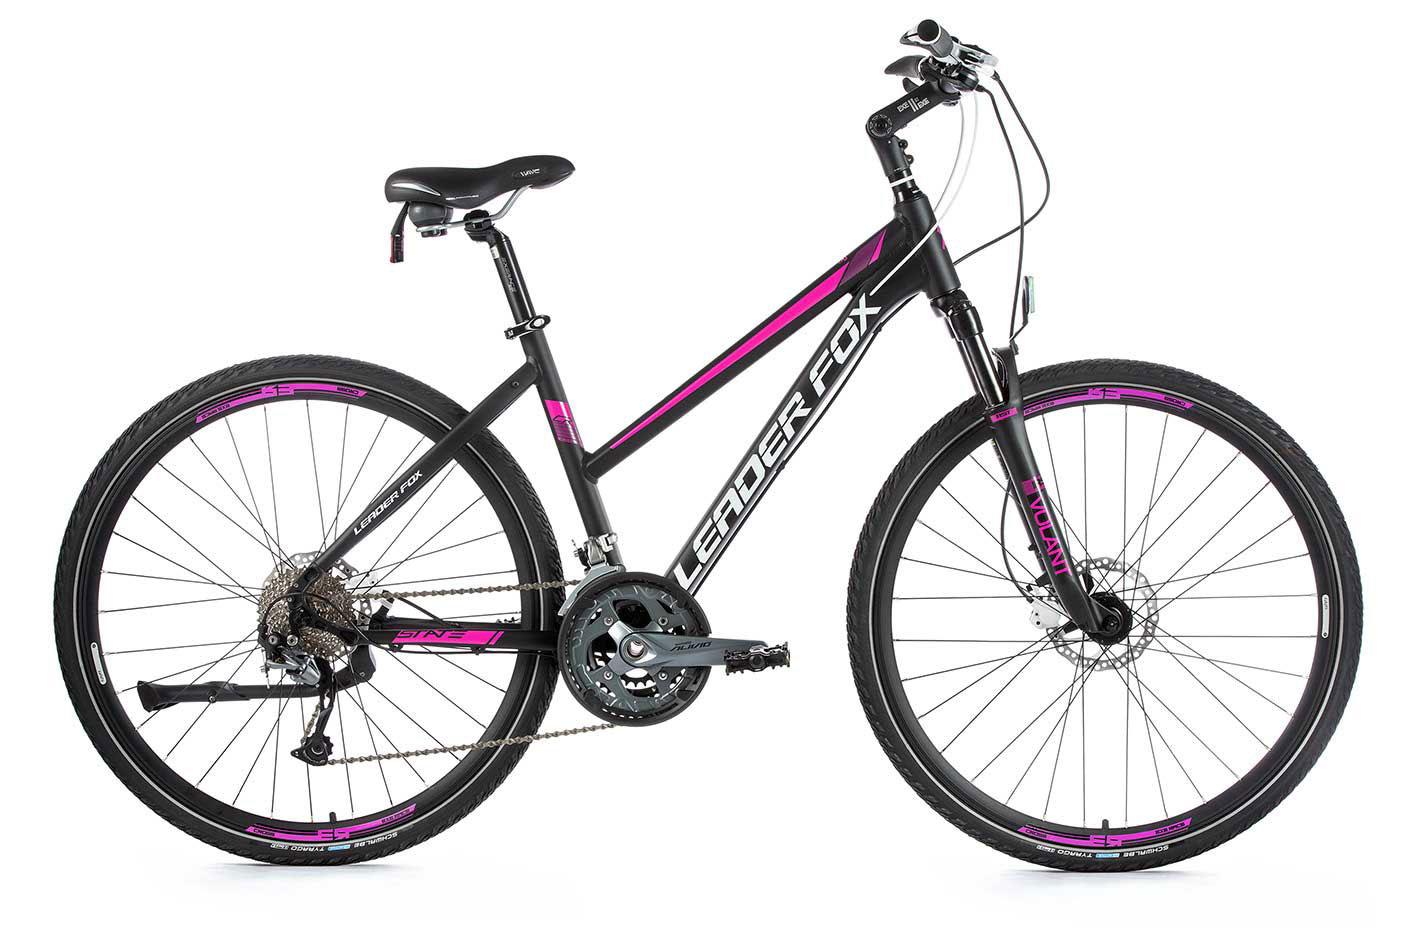 Bicicleta de cross Leader Fox State Lady